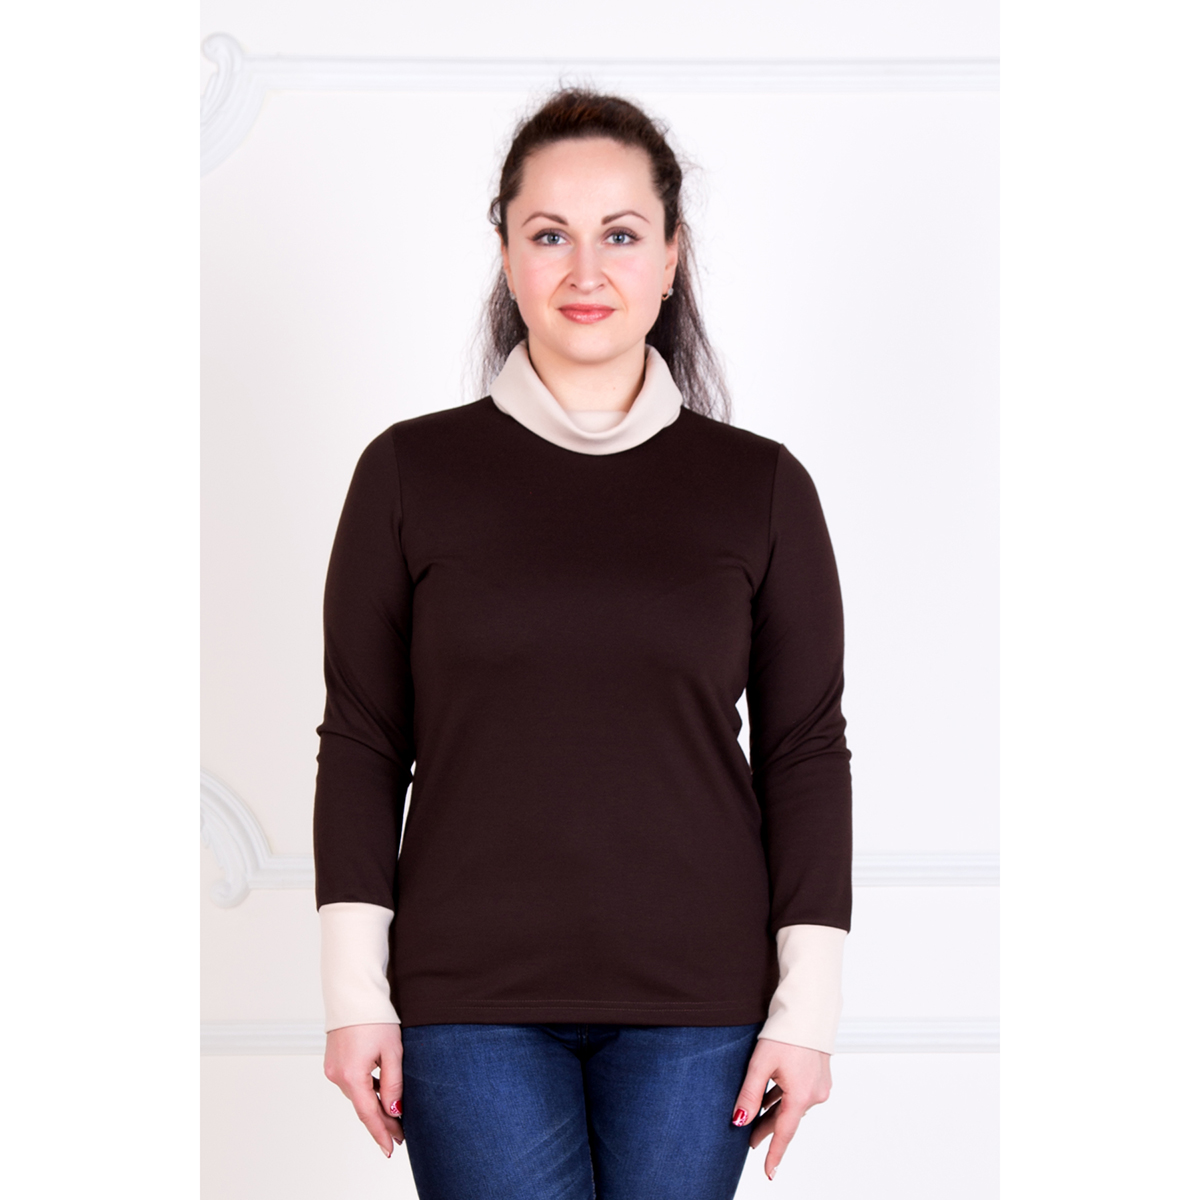 Женская блуза Стайл Темно-коричневый, размер 48Блузки, майки, кофты<br>Обхват груди:96 см<br>Обхват талии:78 см<br>Обхват бедер:104 см<br>Рост:167 см<br><br>Тип: Жен. блуза<br>Размер: 48<br>Материал: Милано